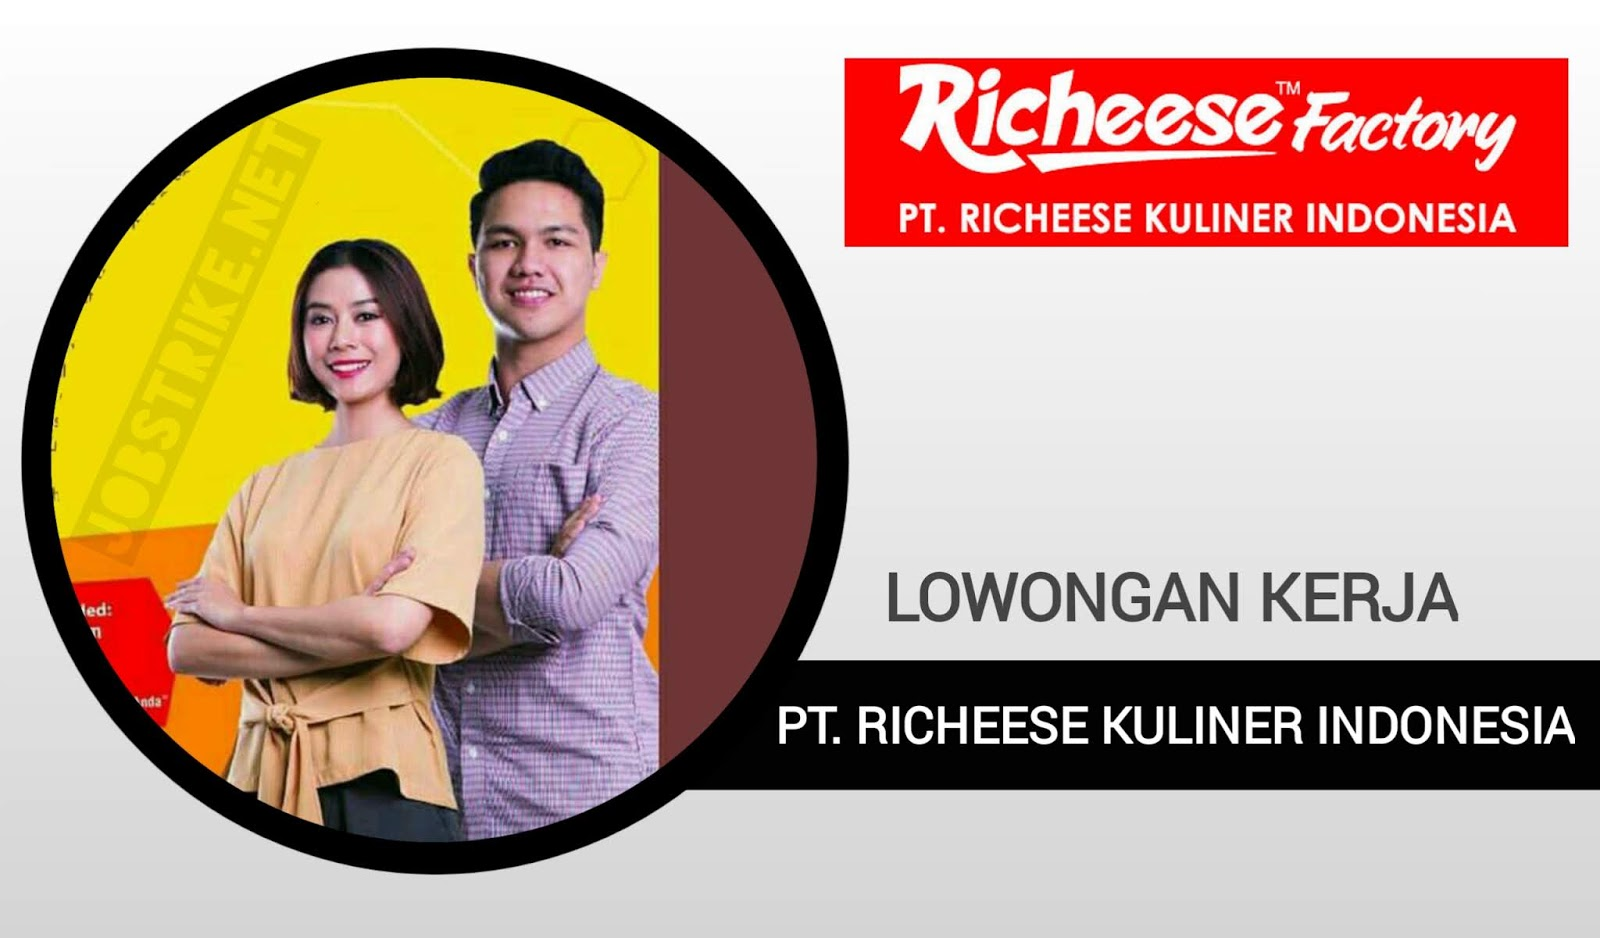 Lowongan Kerja Terbaru Lulusan Sma Smk Pt Richeese Kuliner Indonesia Richeese Factory Tersedia 9